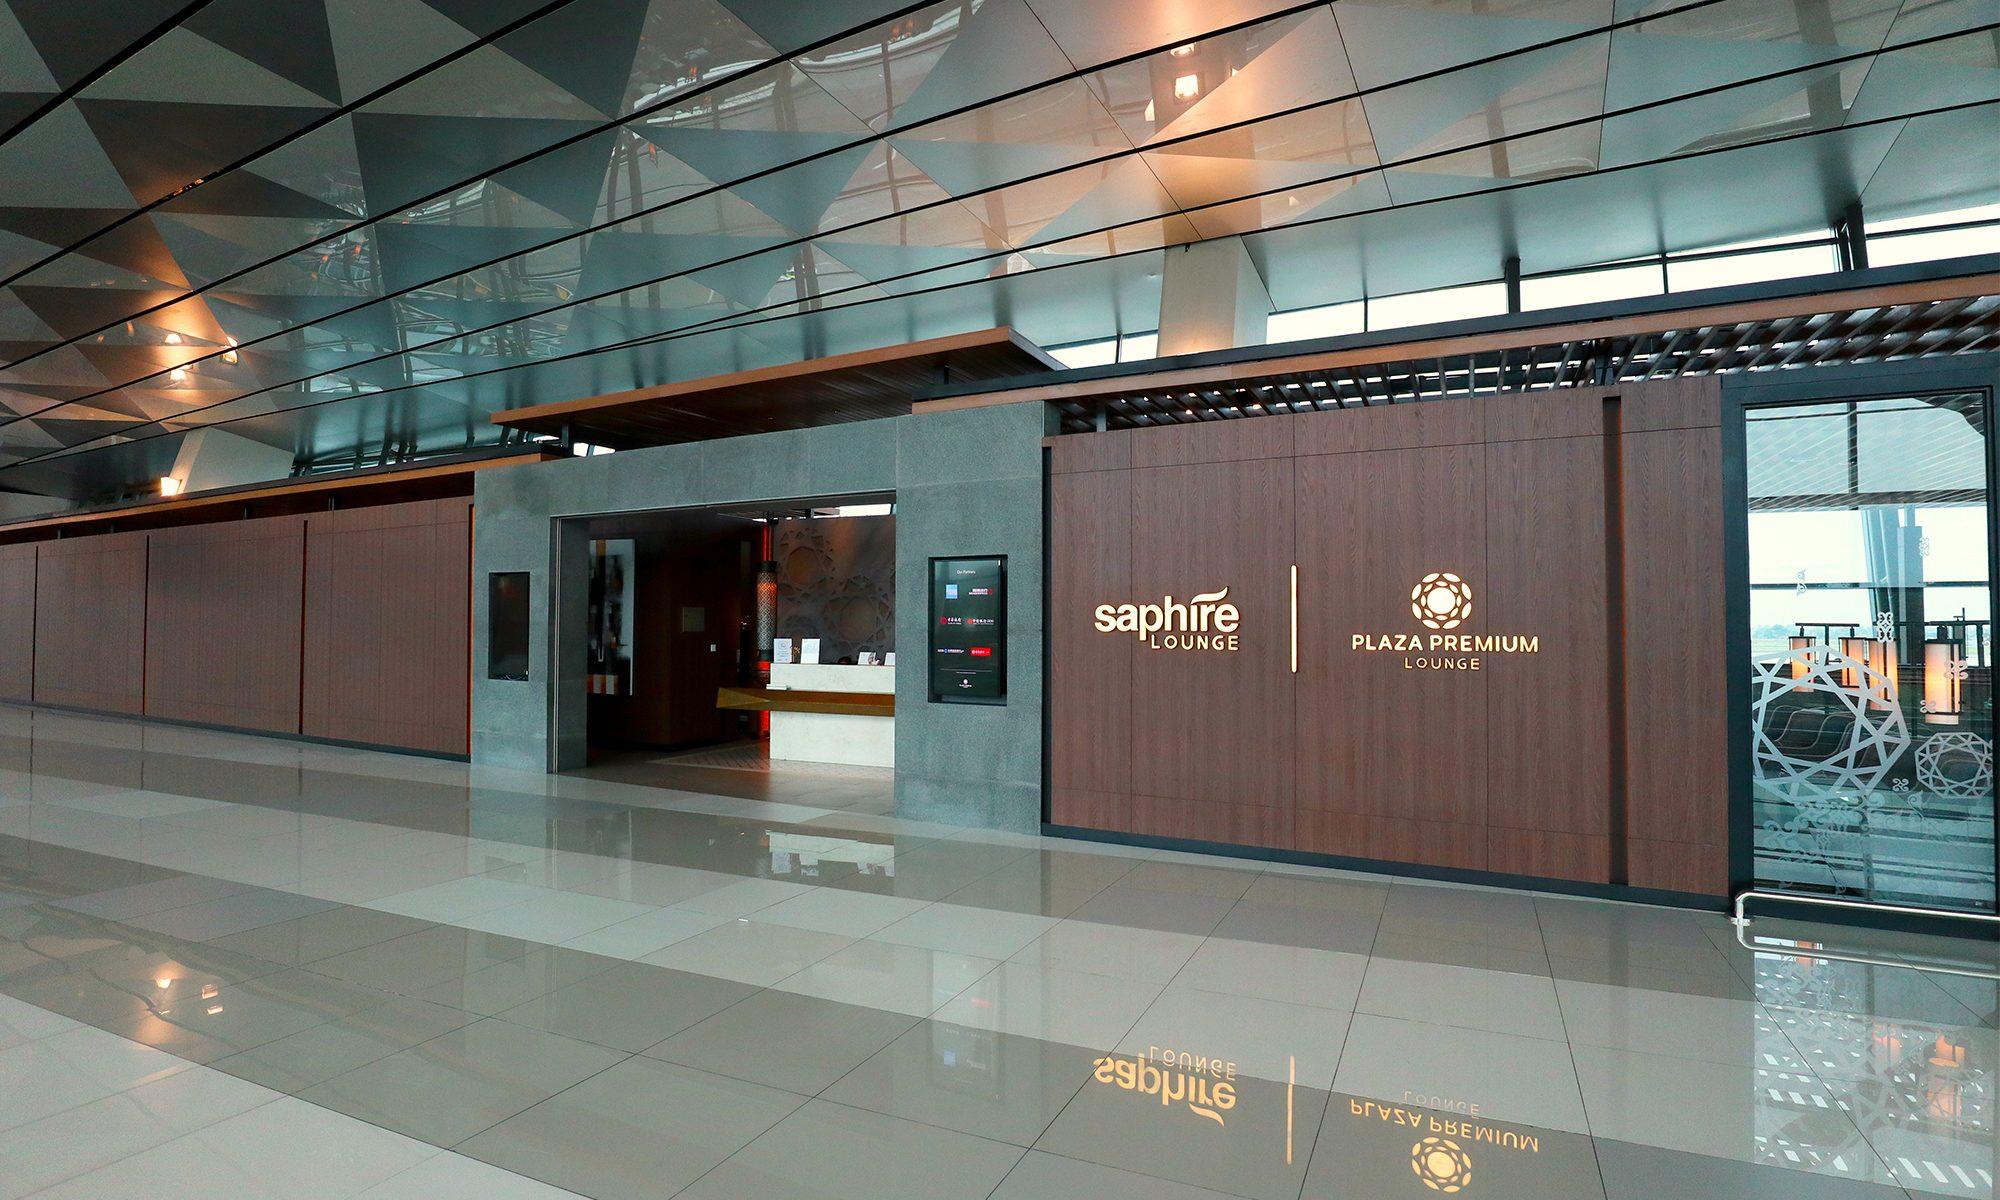 Review Saphire Plaza Premium Lounge Jakarta T3 Mainly Miles